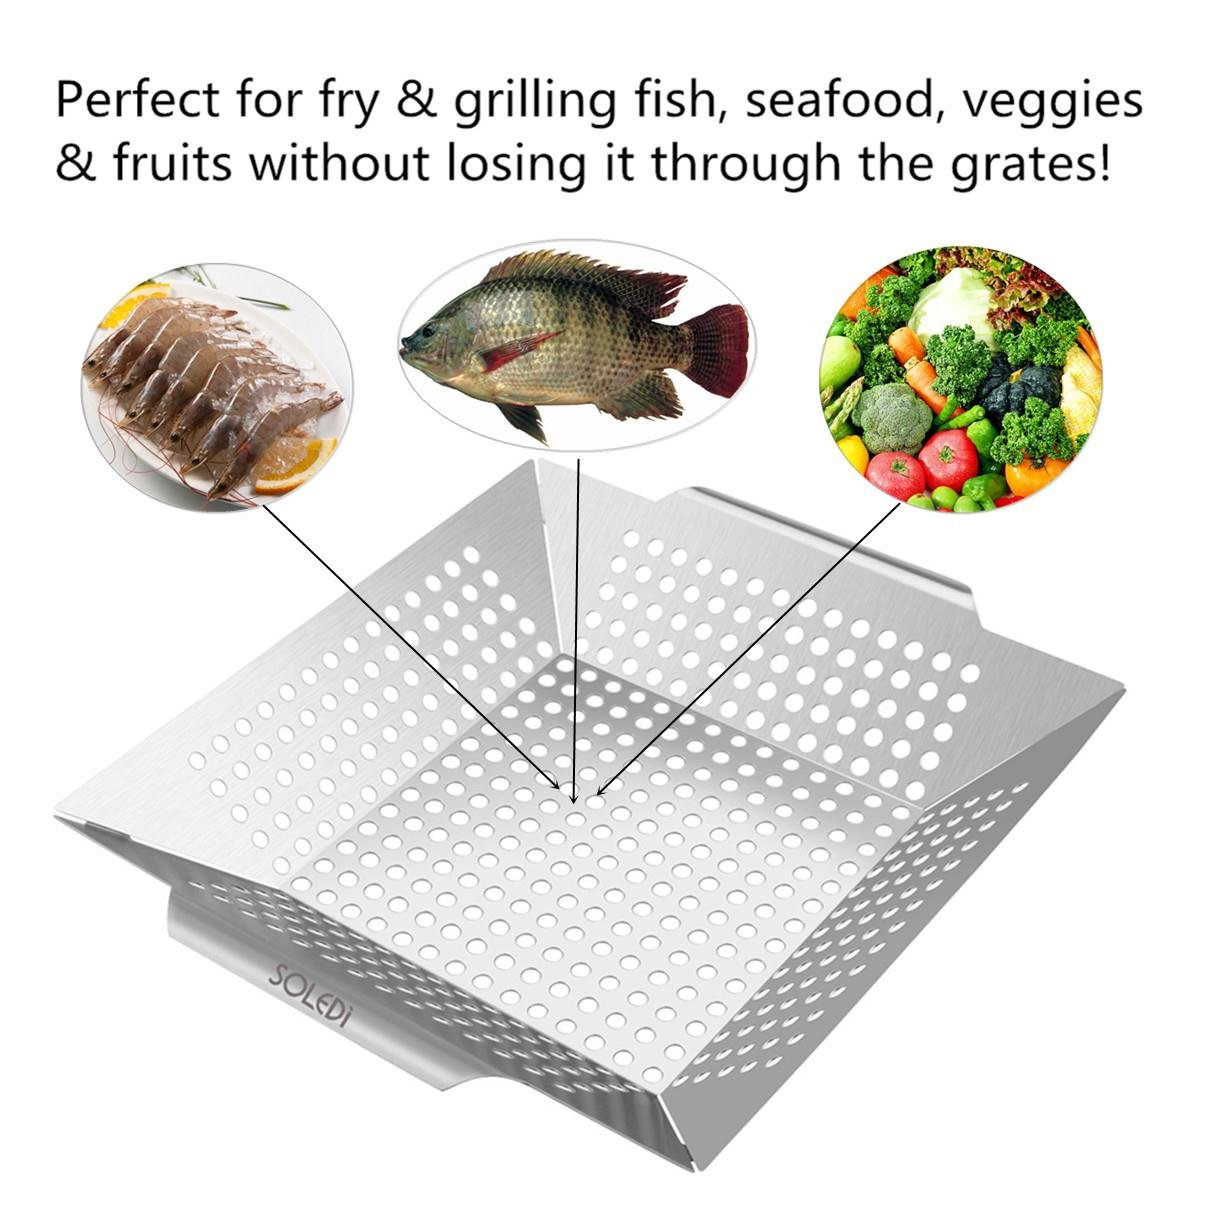 Grill Basket Soledi Grilling Accessories Professional Grade 430 Stainless Steel Wok, Meat Grilling Basket, BBQ, Barbecue, Veggie, Fish, Quesadilla, Shrimp, Corn, Kabob